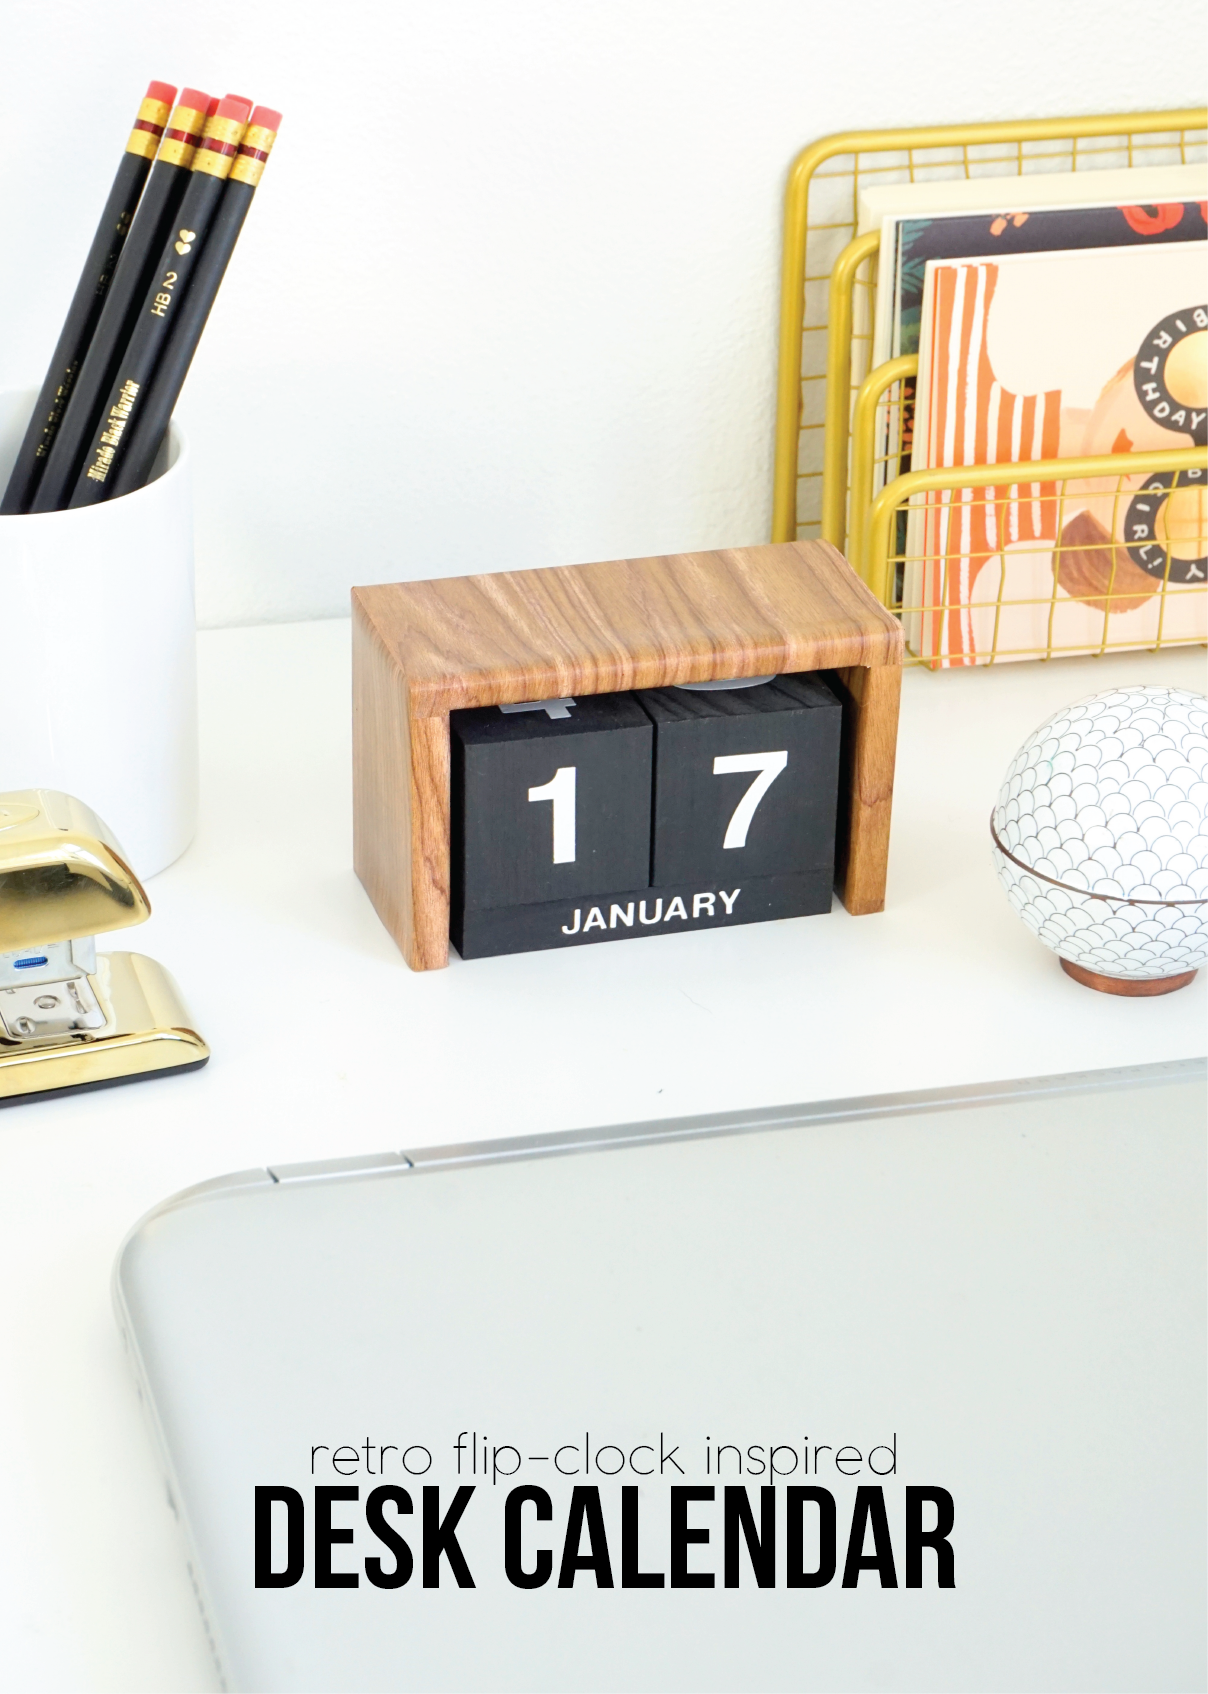 Flip Clock Inspired Desk Calendar Wooden Desk Calendar Diy Desk